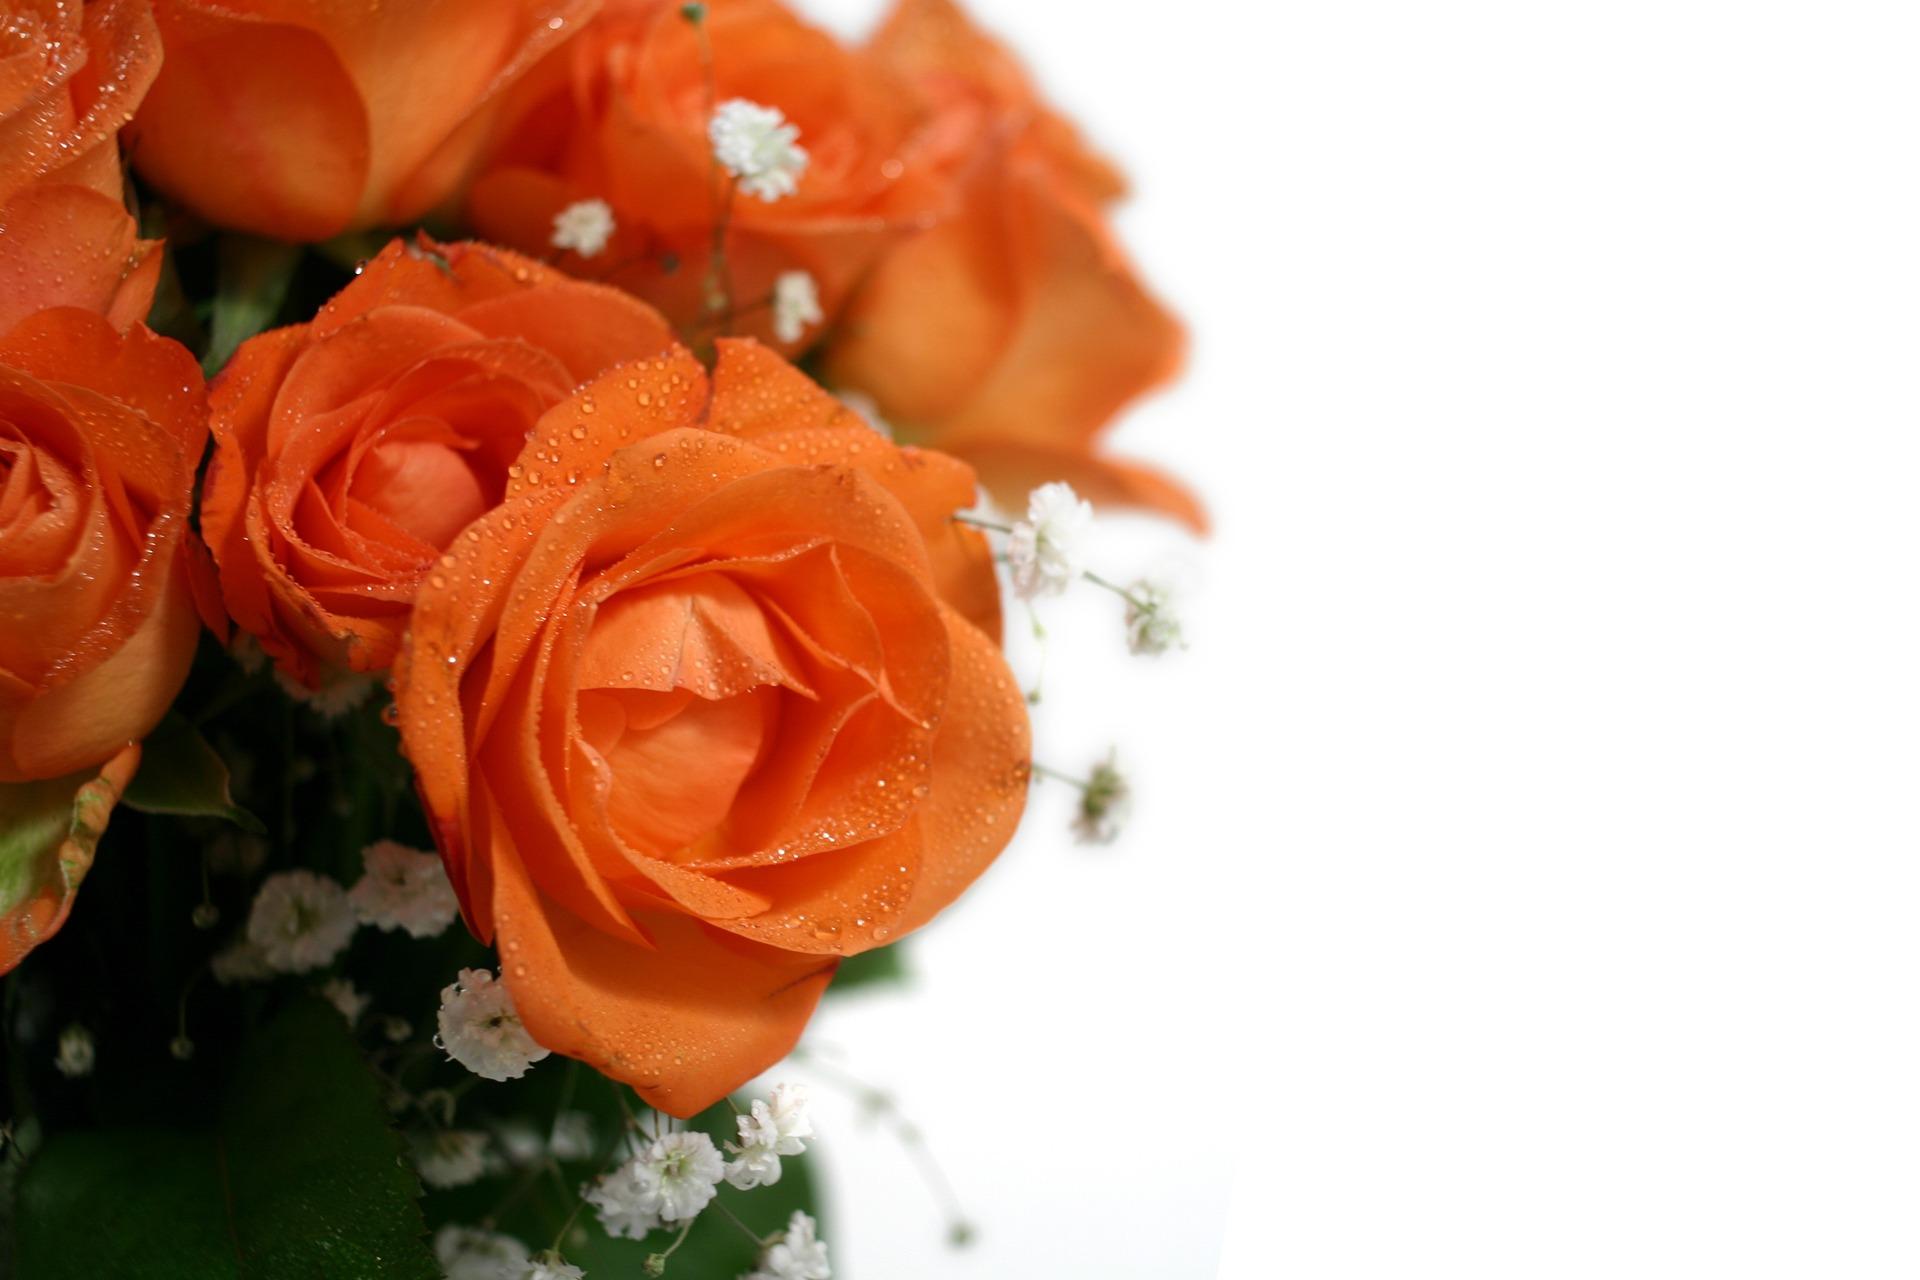 roses-1029194_1920